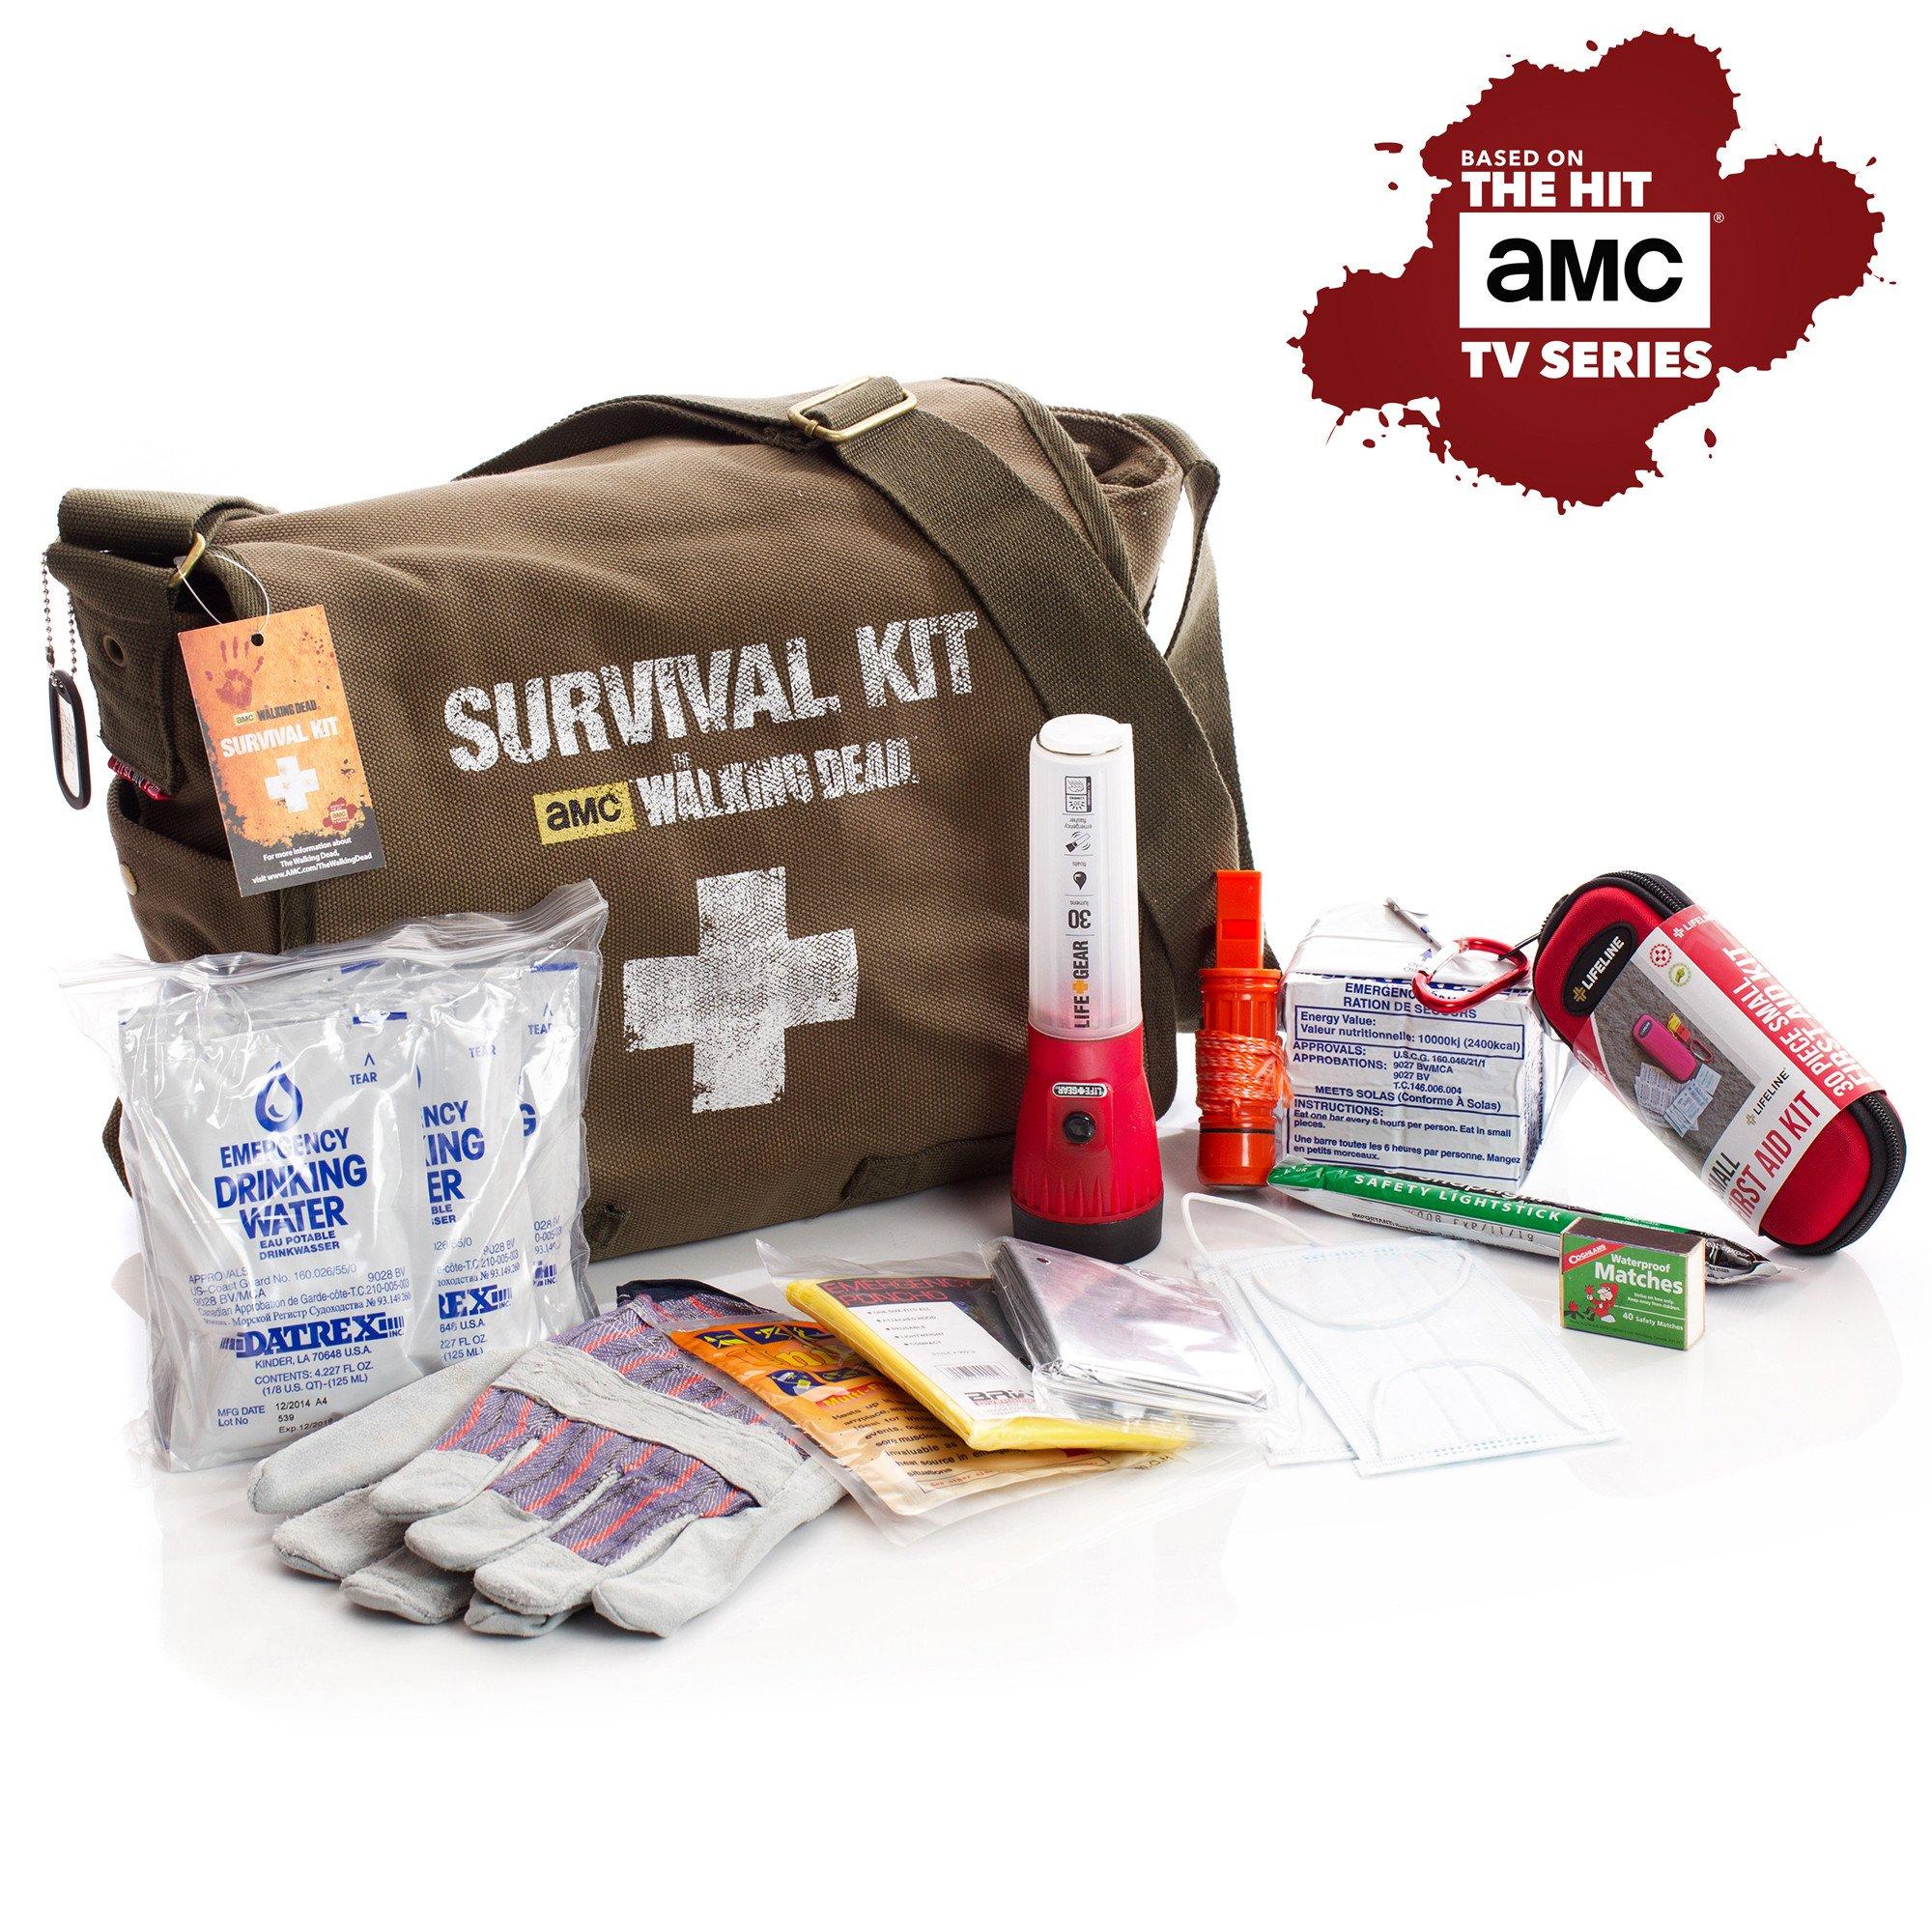 amc the walking dead survival first aid kit